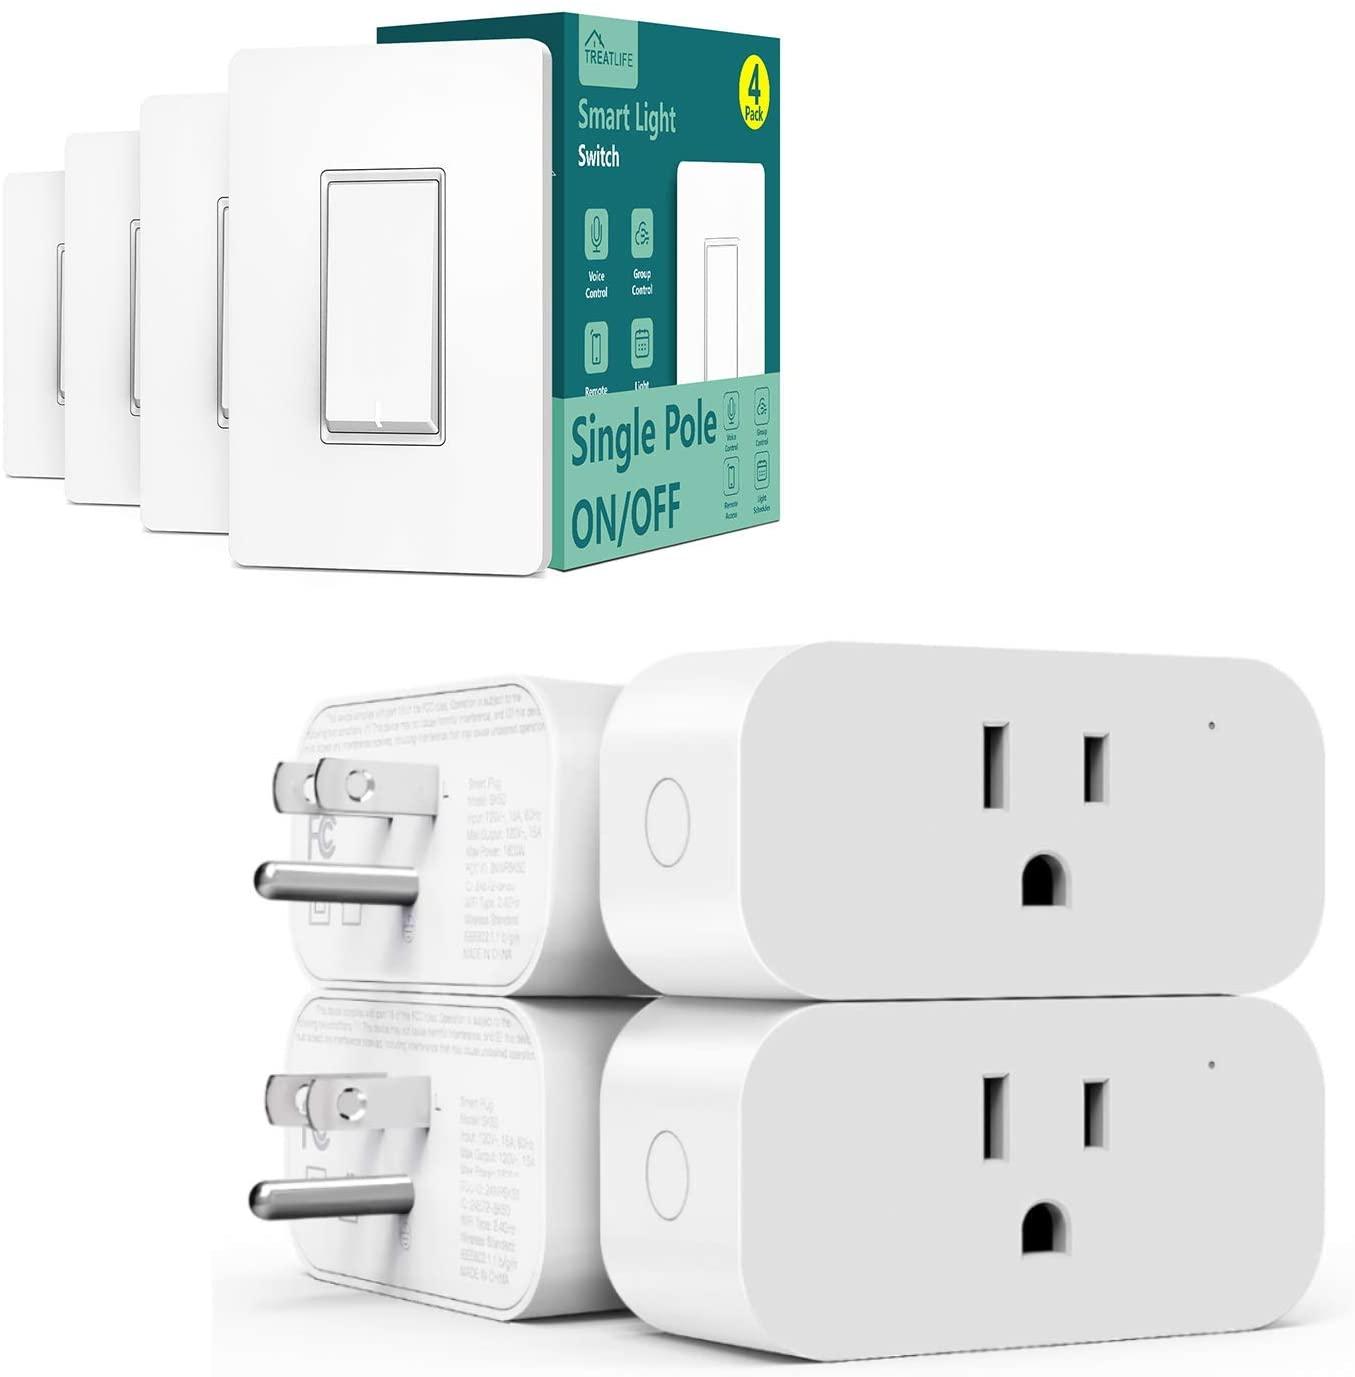 Smart Light Switch 4 Pack+ WiFi Smart Plug 4 Pack Bundles